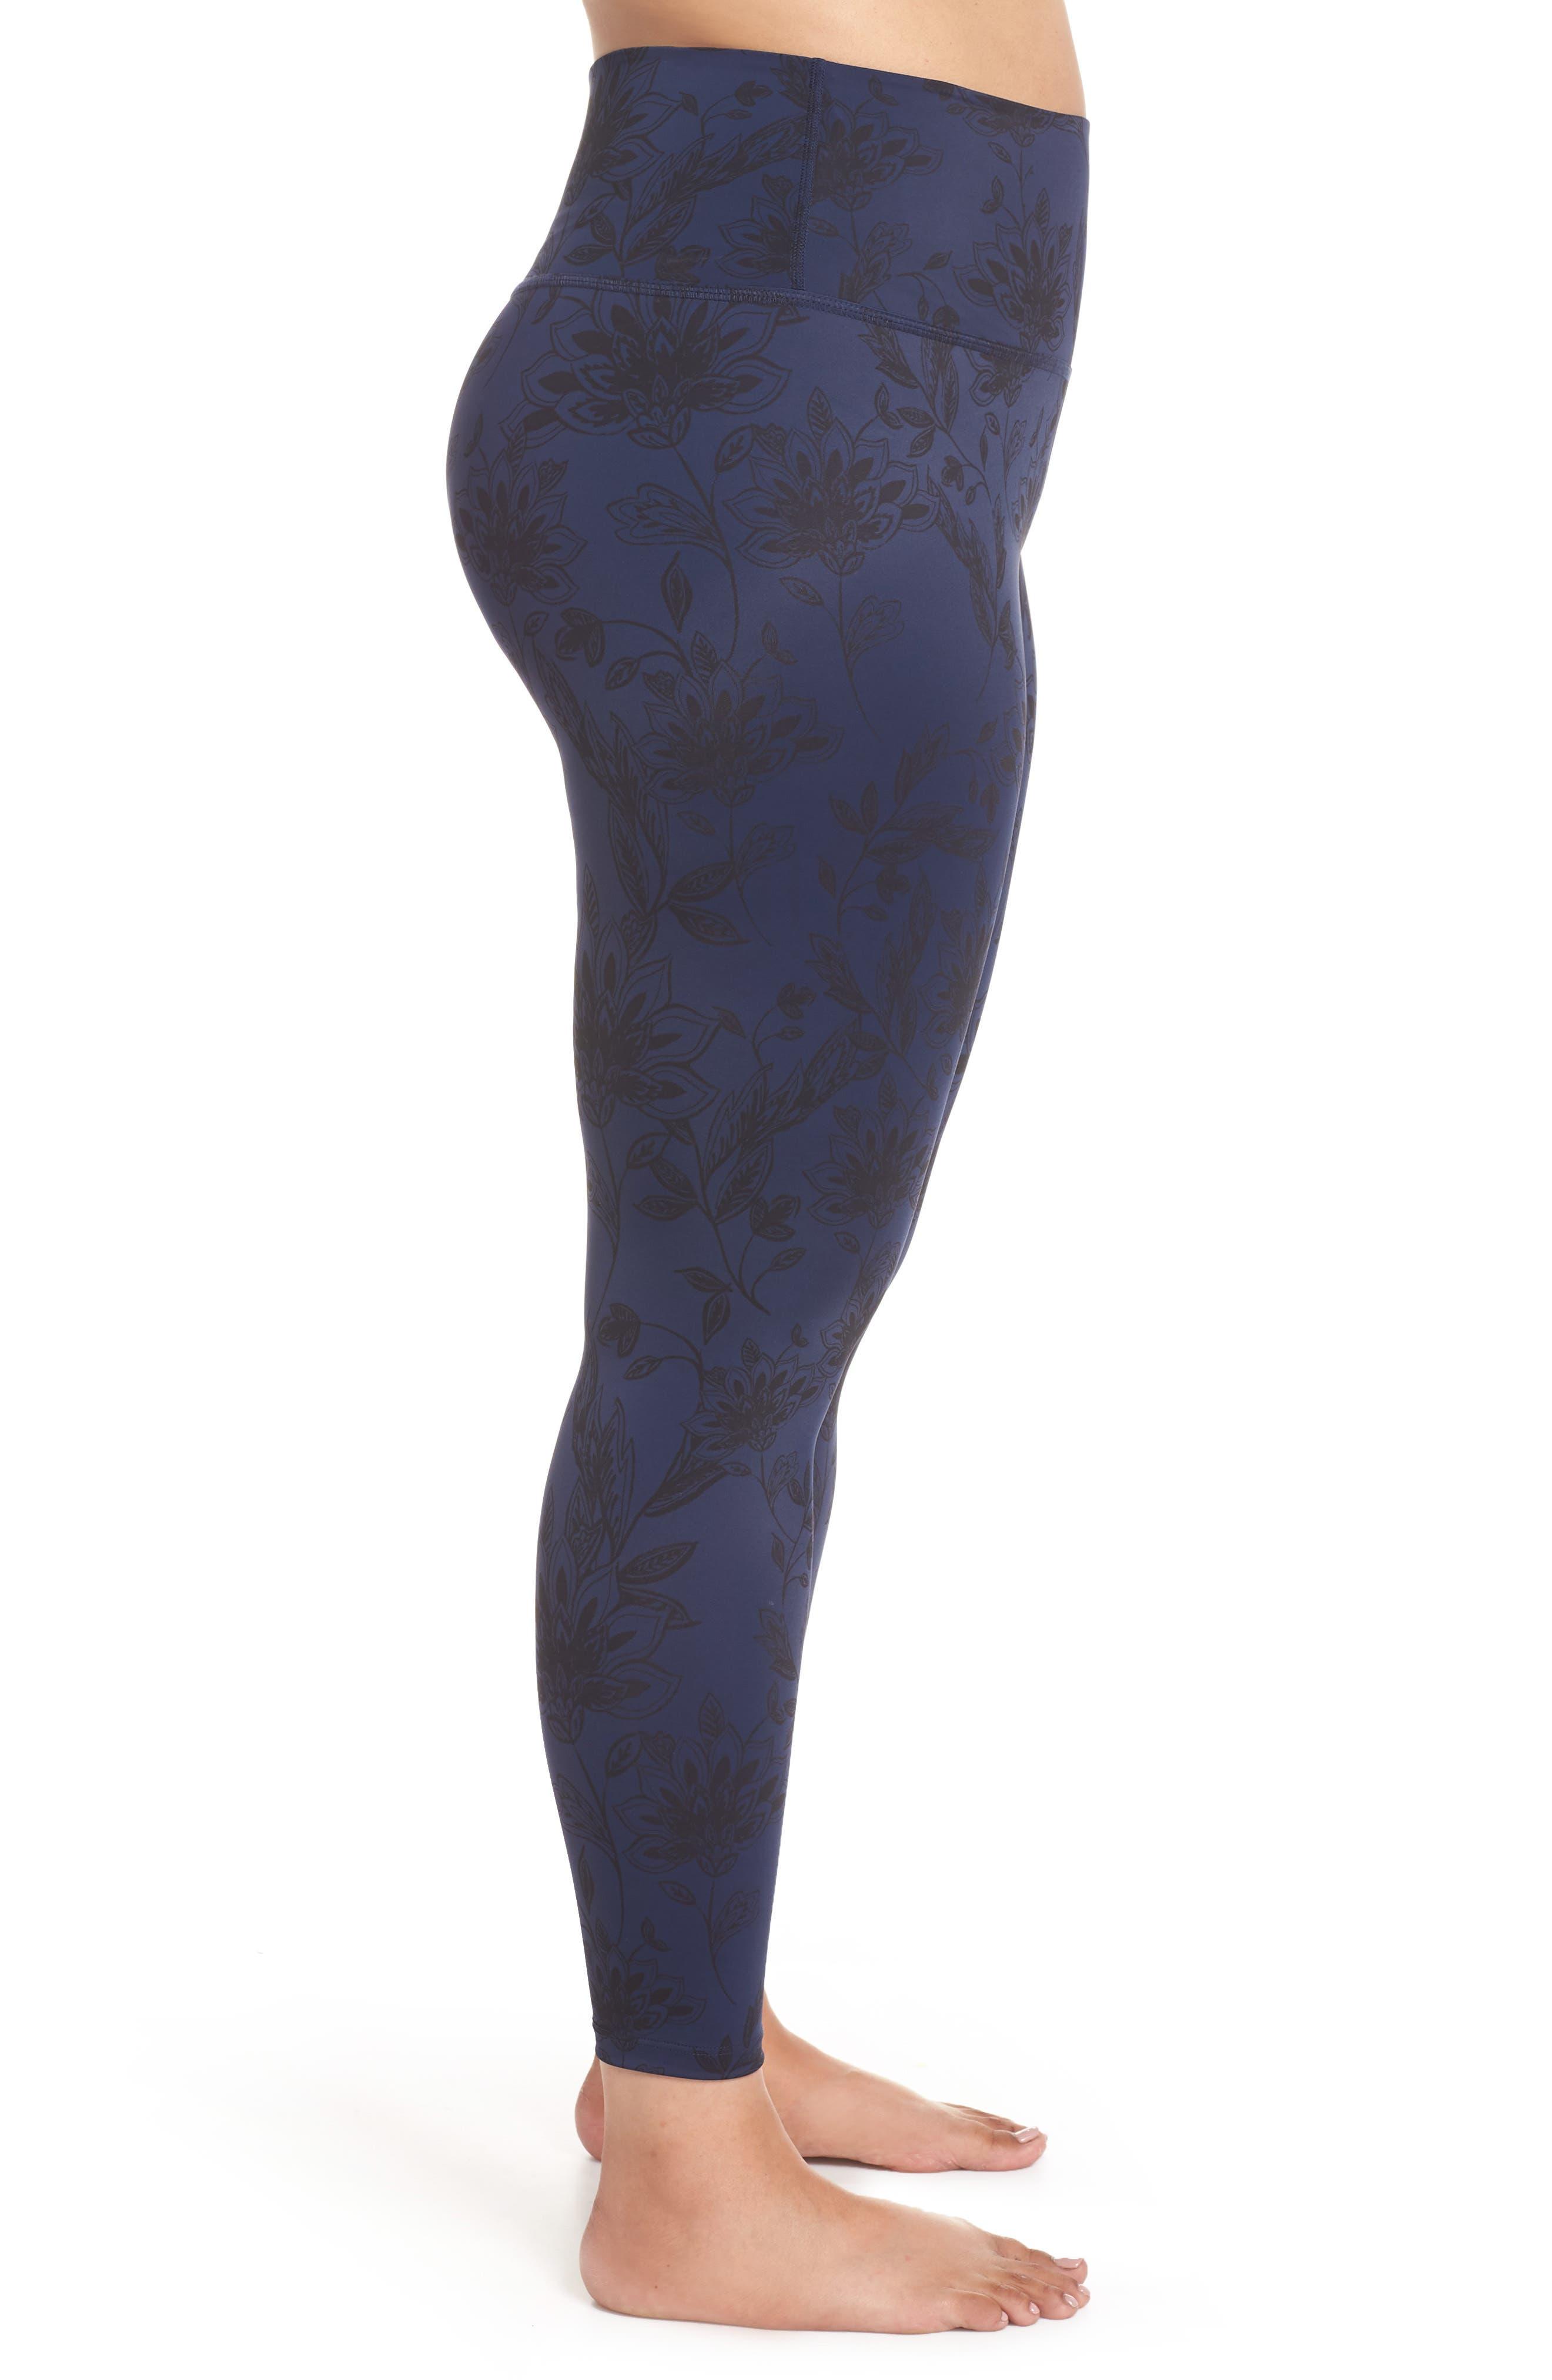 Compression High Waist BOPO Midi Leggings,                             Alternate thumbnail 3, color,                             DESERT FLORAL